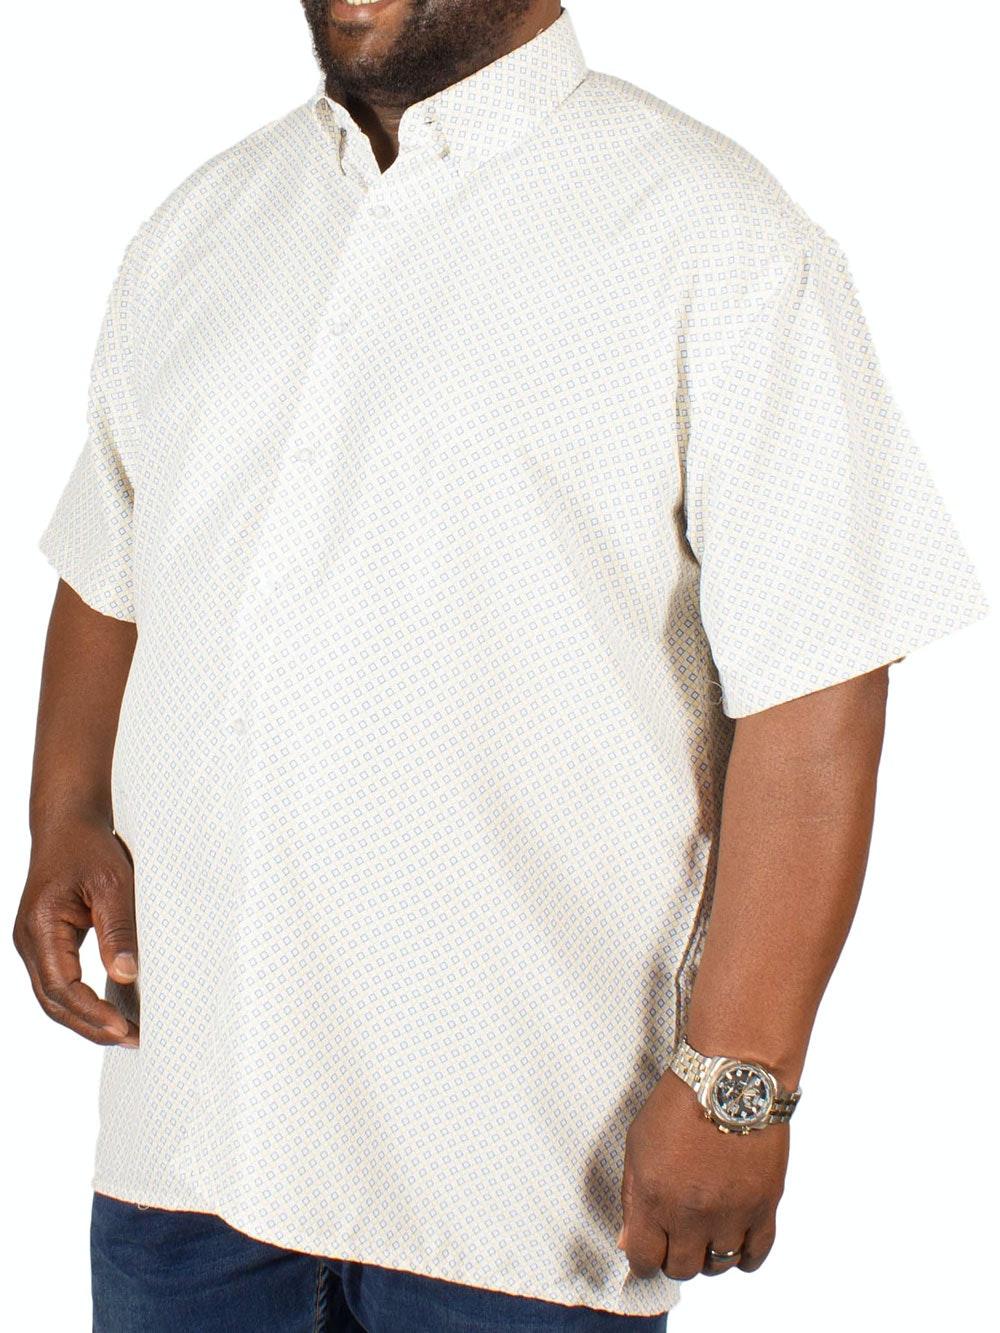 Fitzgerald Marcus Diamond Print Shirt Yellow/Blue